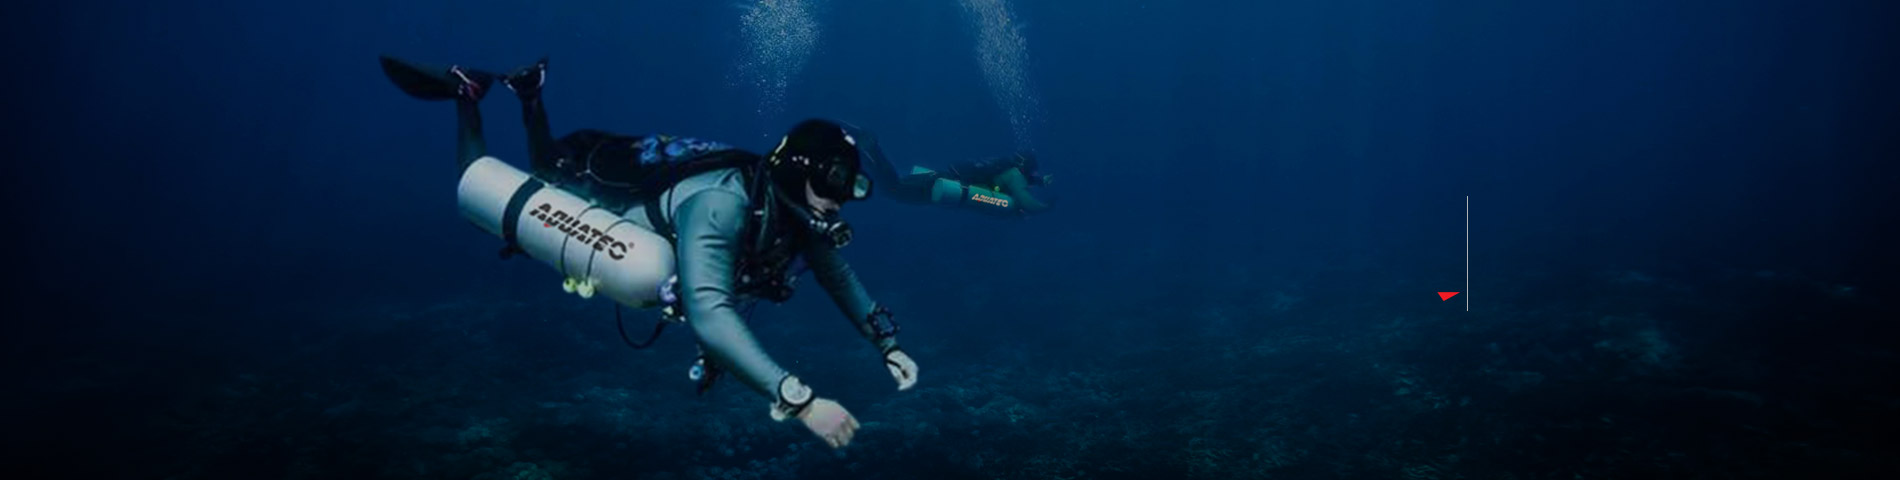 Descubrir AQUATEC Profesional Submarinismo (bucear) equipo